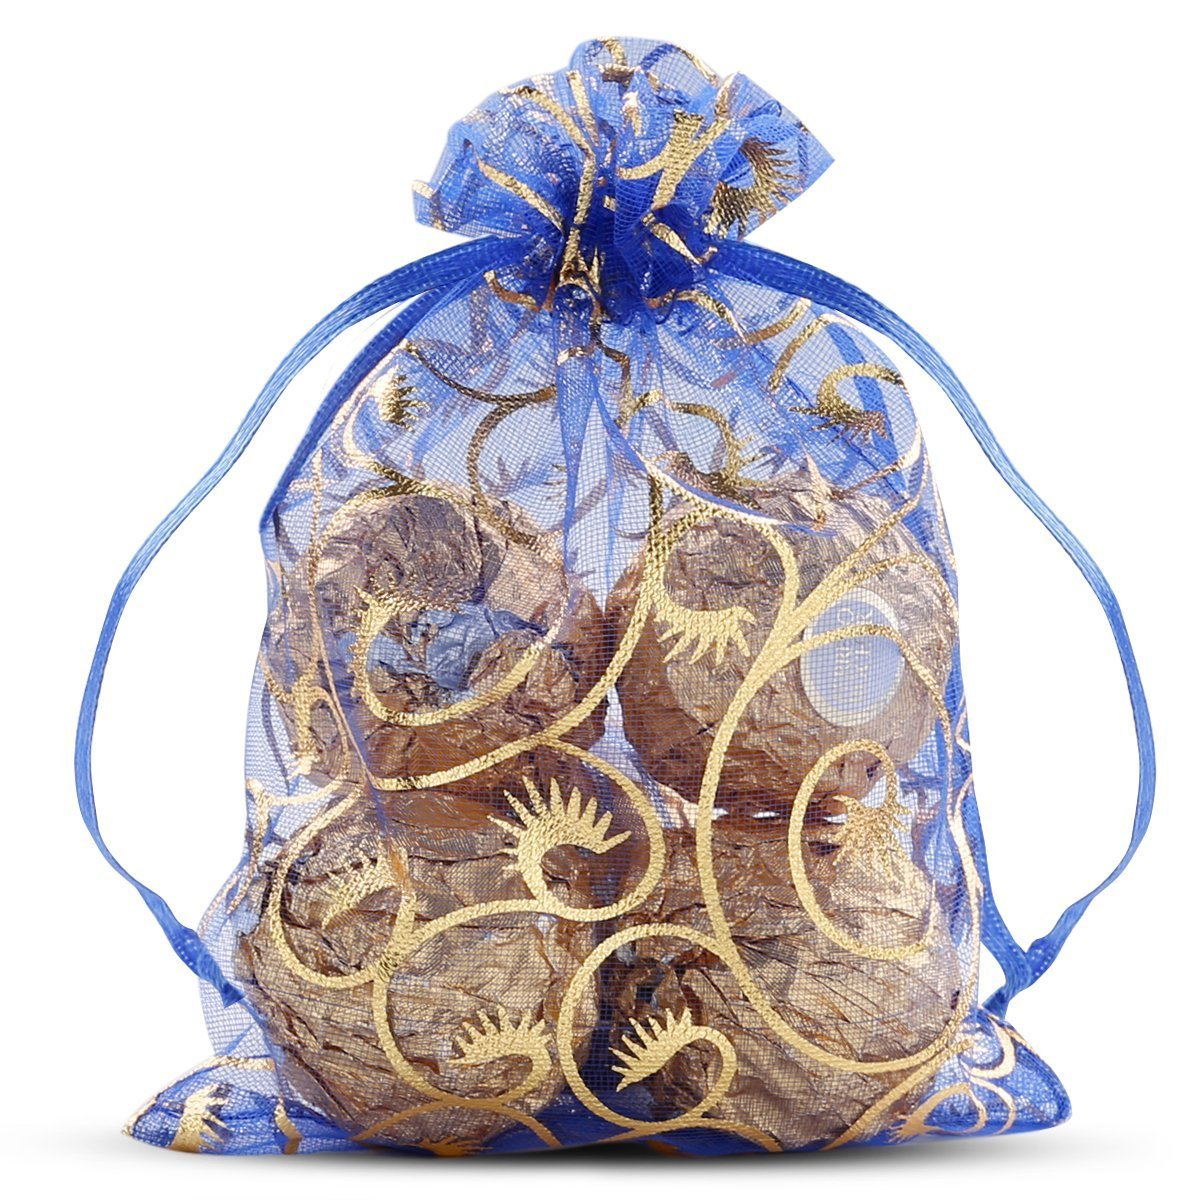 Wuligirl 100pcs 4x6 Drawstring Organza Jewelry Candy Pouches Wedding Party Favor Gift Bags iPhone 8 Plus/7 Plus/6 Plus Bags for Women Men Girls (Blue Eyelash)